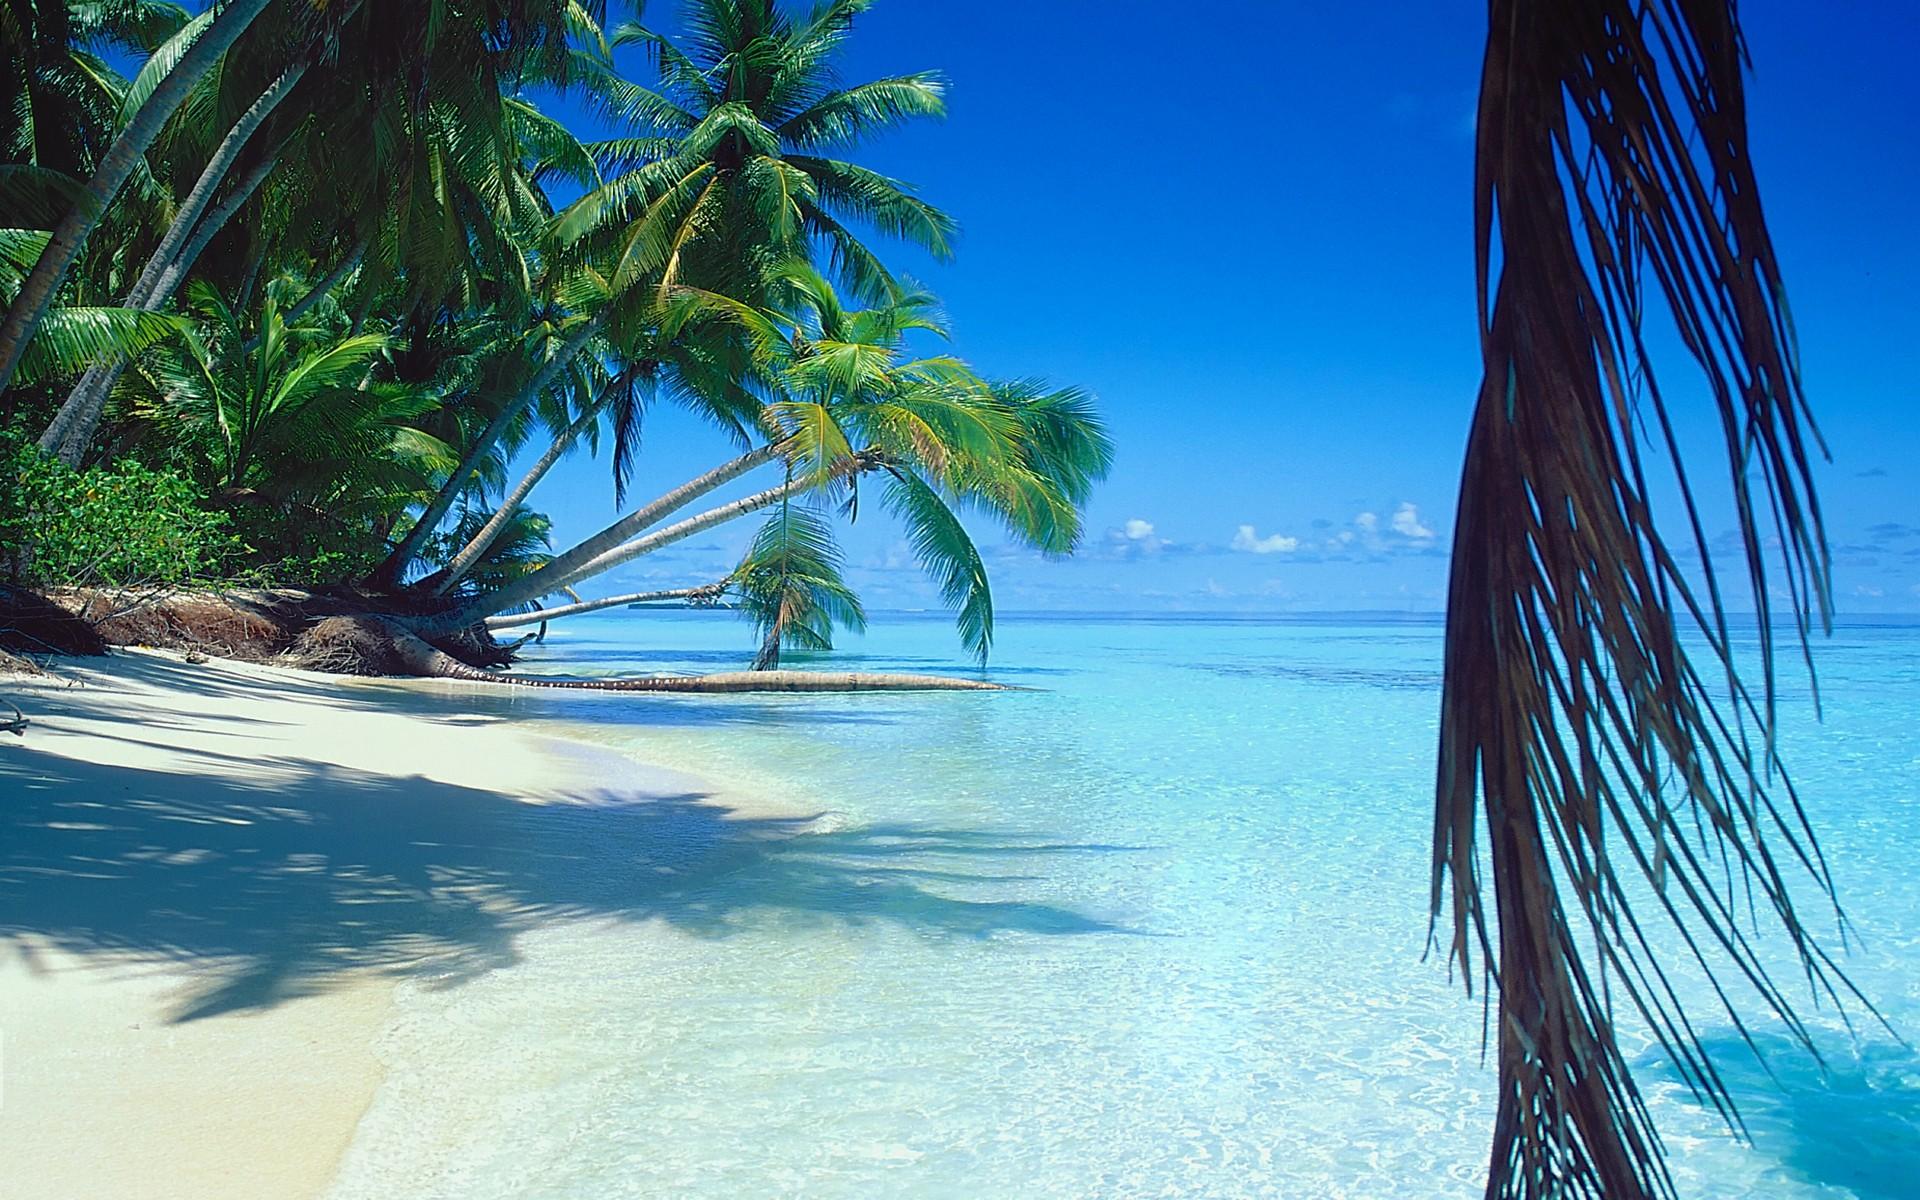 Wallpaper Caribbean Sea Beach Sunset Palm Trees Hd 5k: Fondos De Pantalla : Luz De Sol, Paisaje, Mar, Bahía, Agua